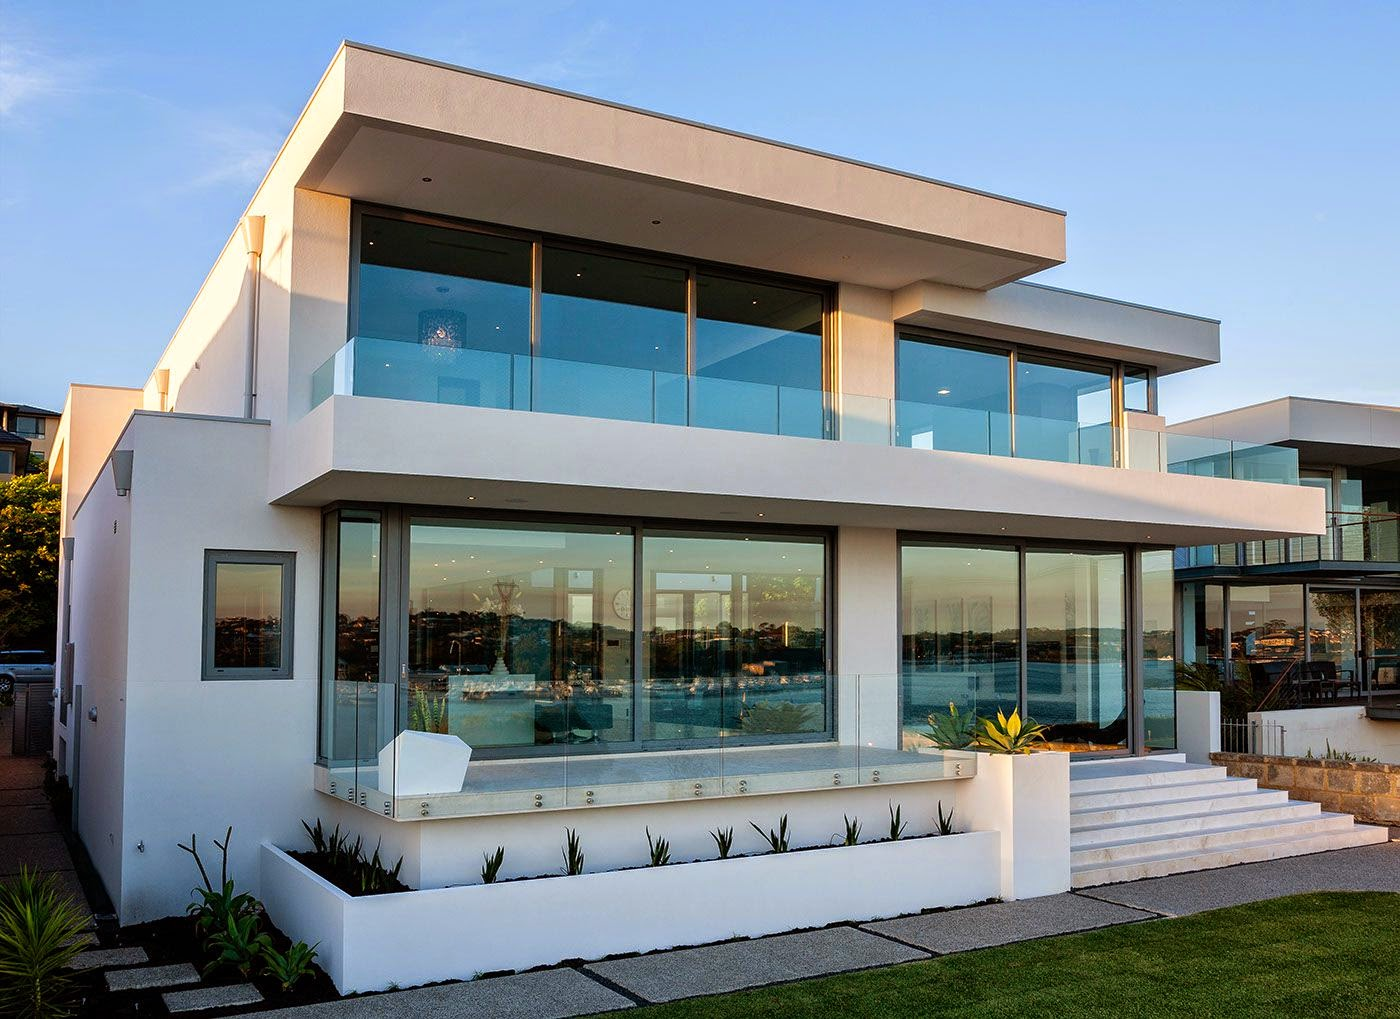 Hogares frescos relajada y acogedora moderna casa de la for La casa moderna